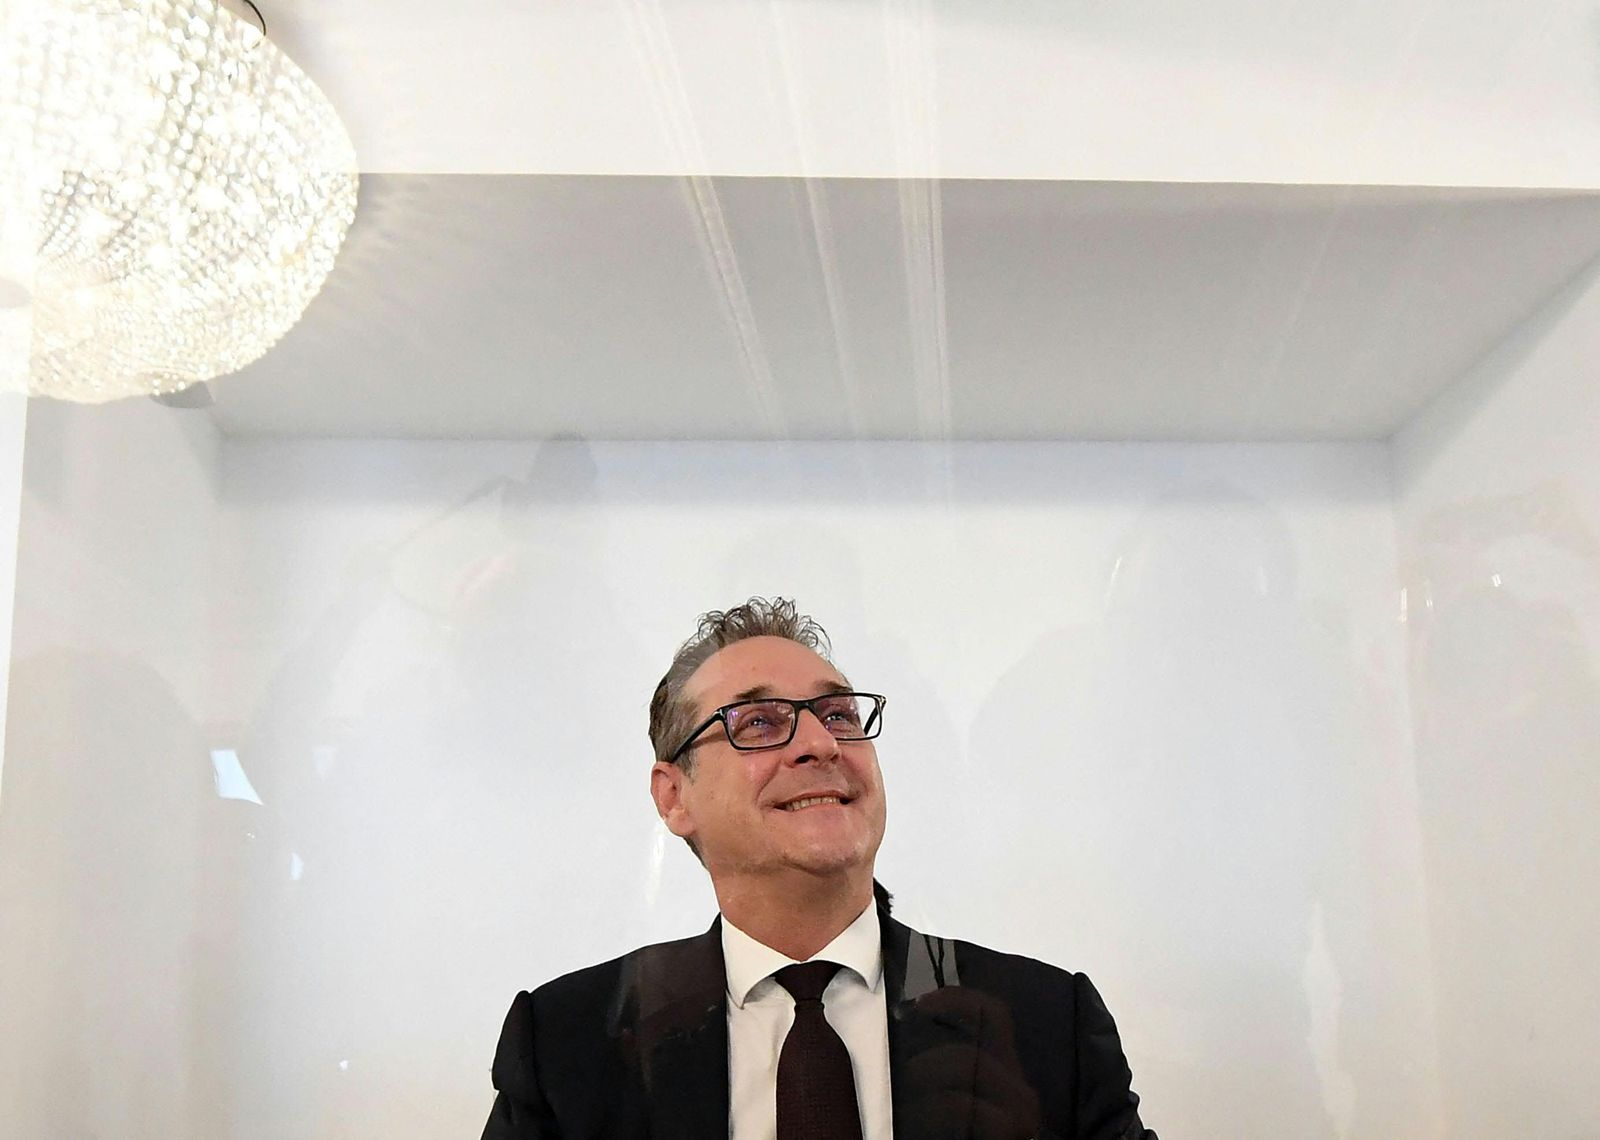 FILES-AUSTRIA-POLITICS-CORRUPTION